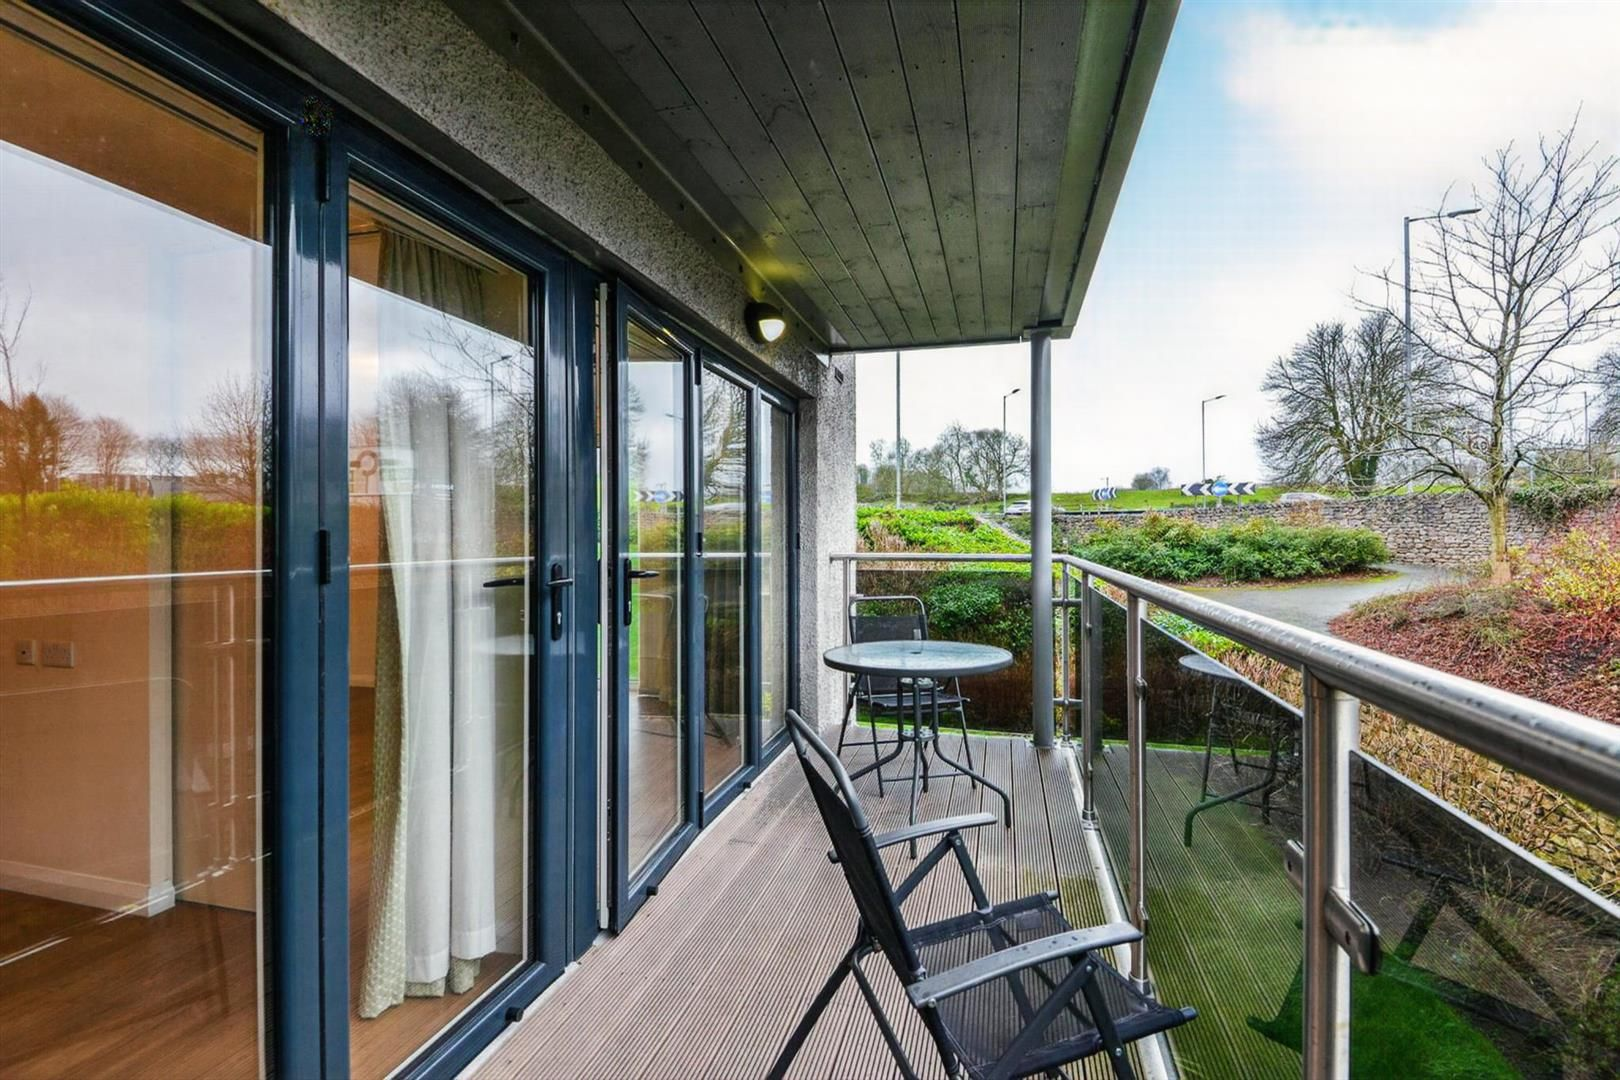 Property photo 1 of 10. Balcony.Jpg